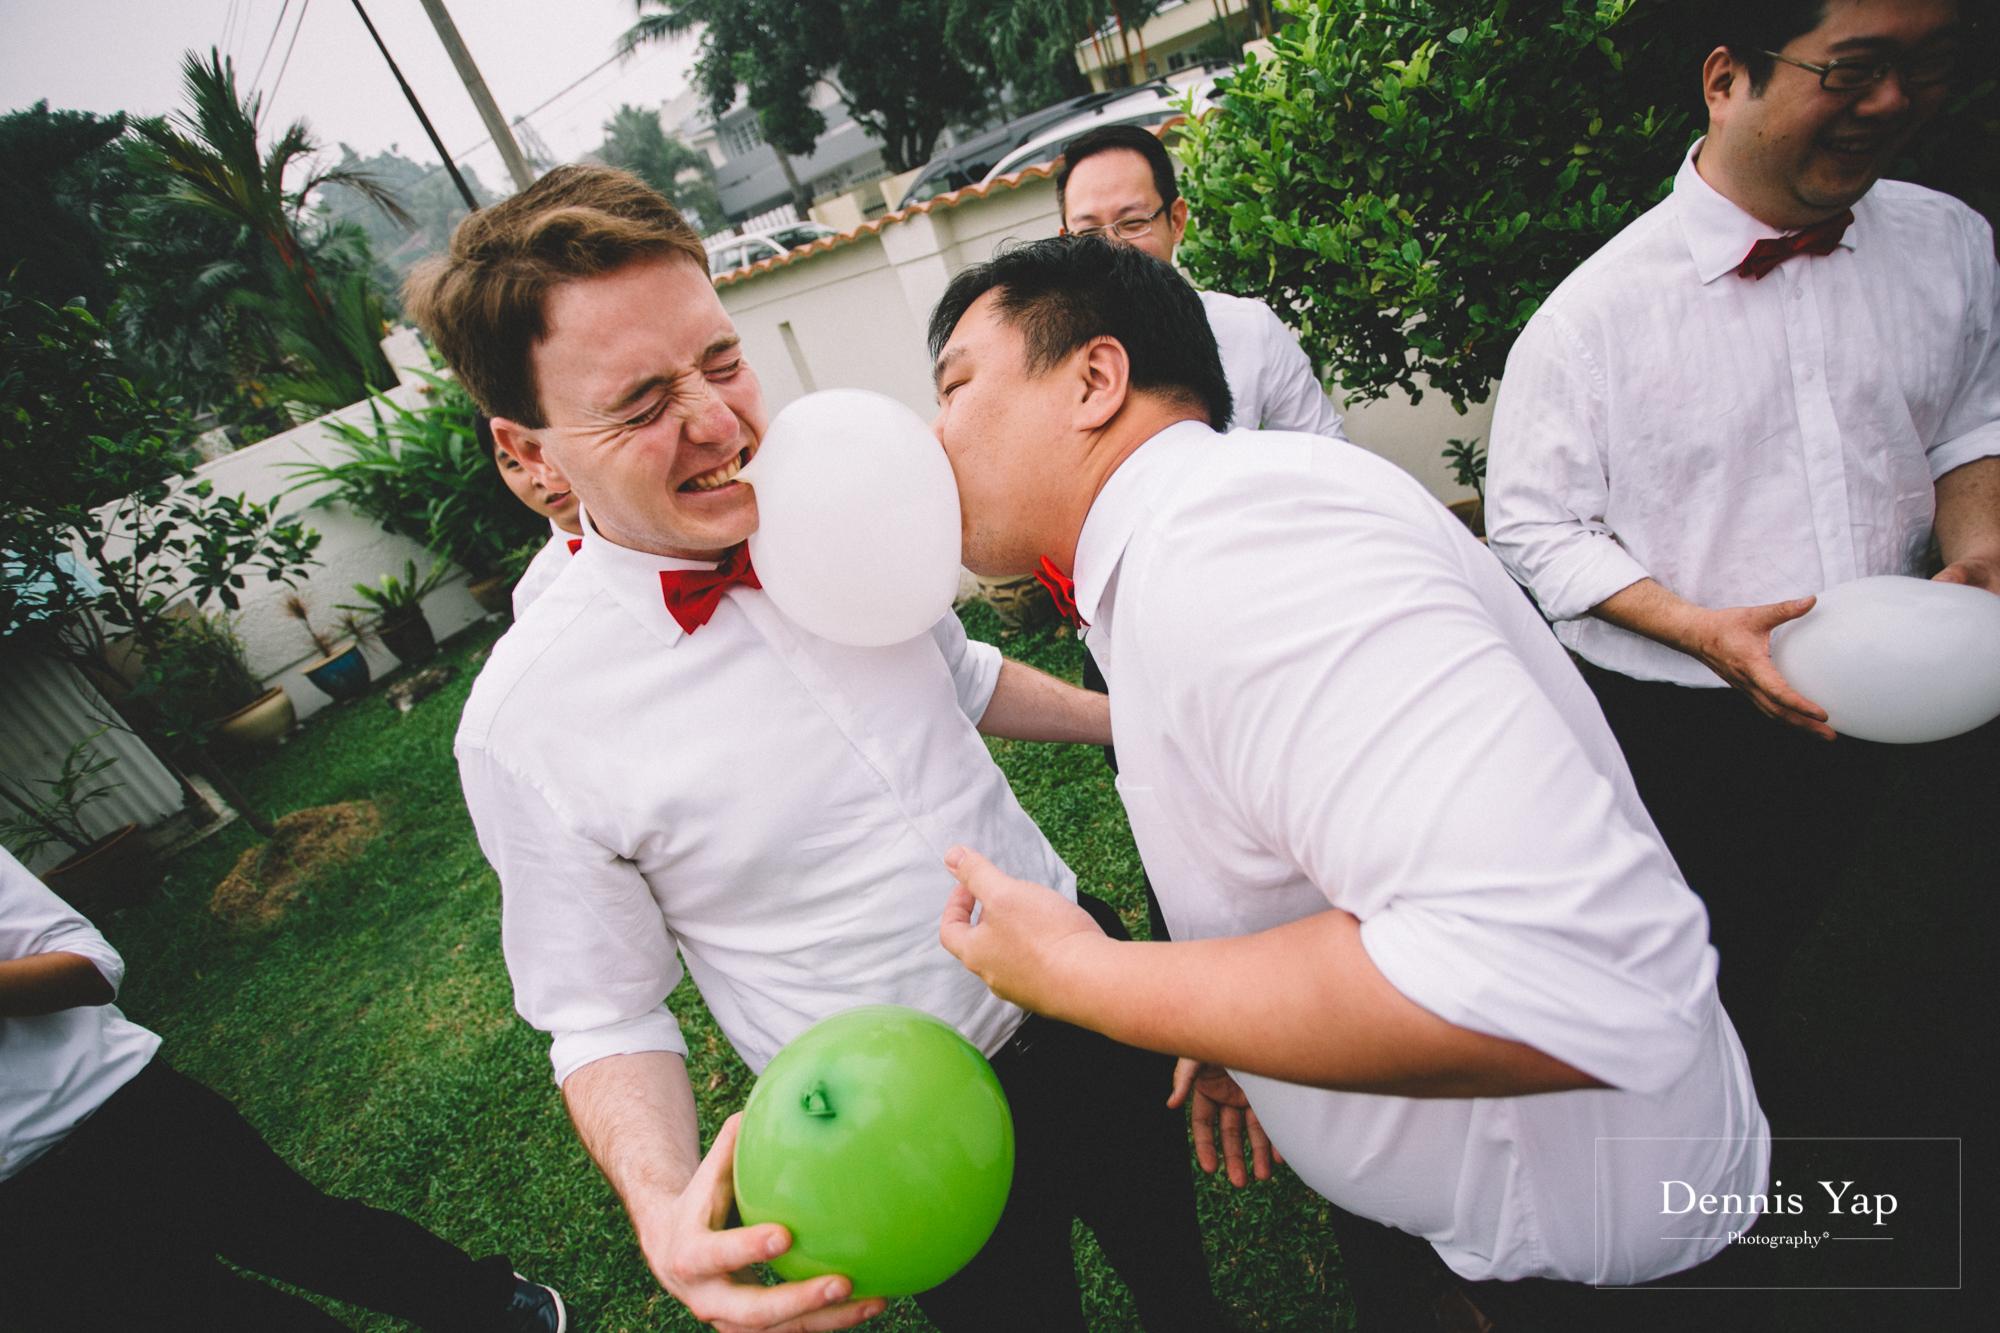 alex shir ley wedding day gate crash subang jaya usj dennis yap photography moments-5.jpg